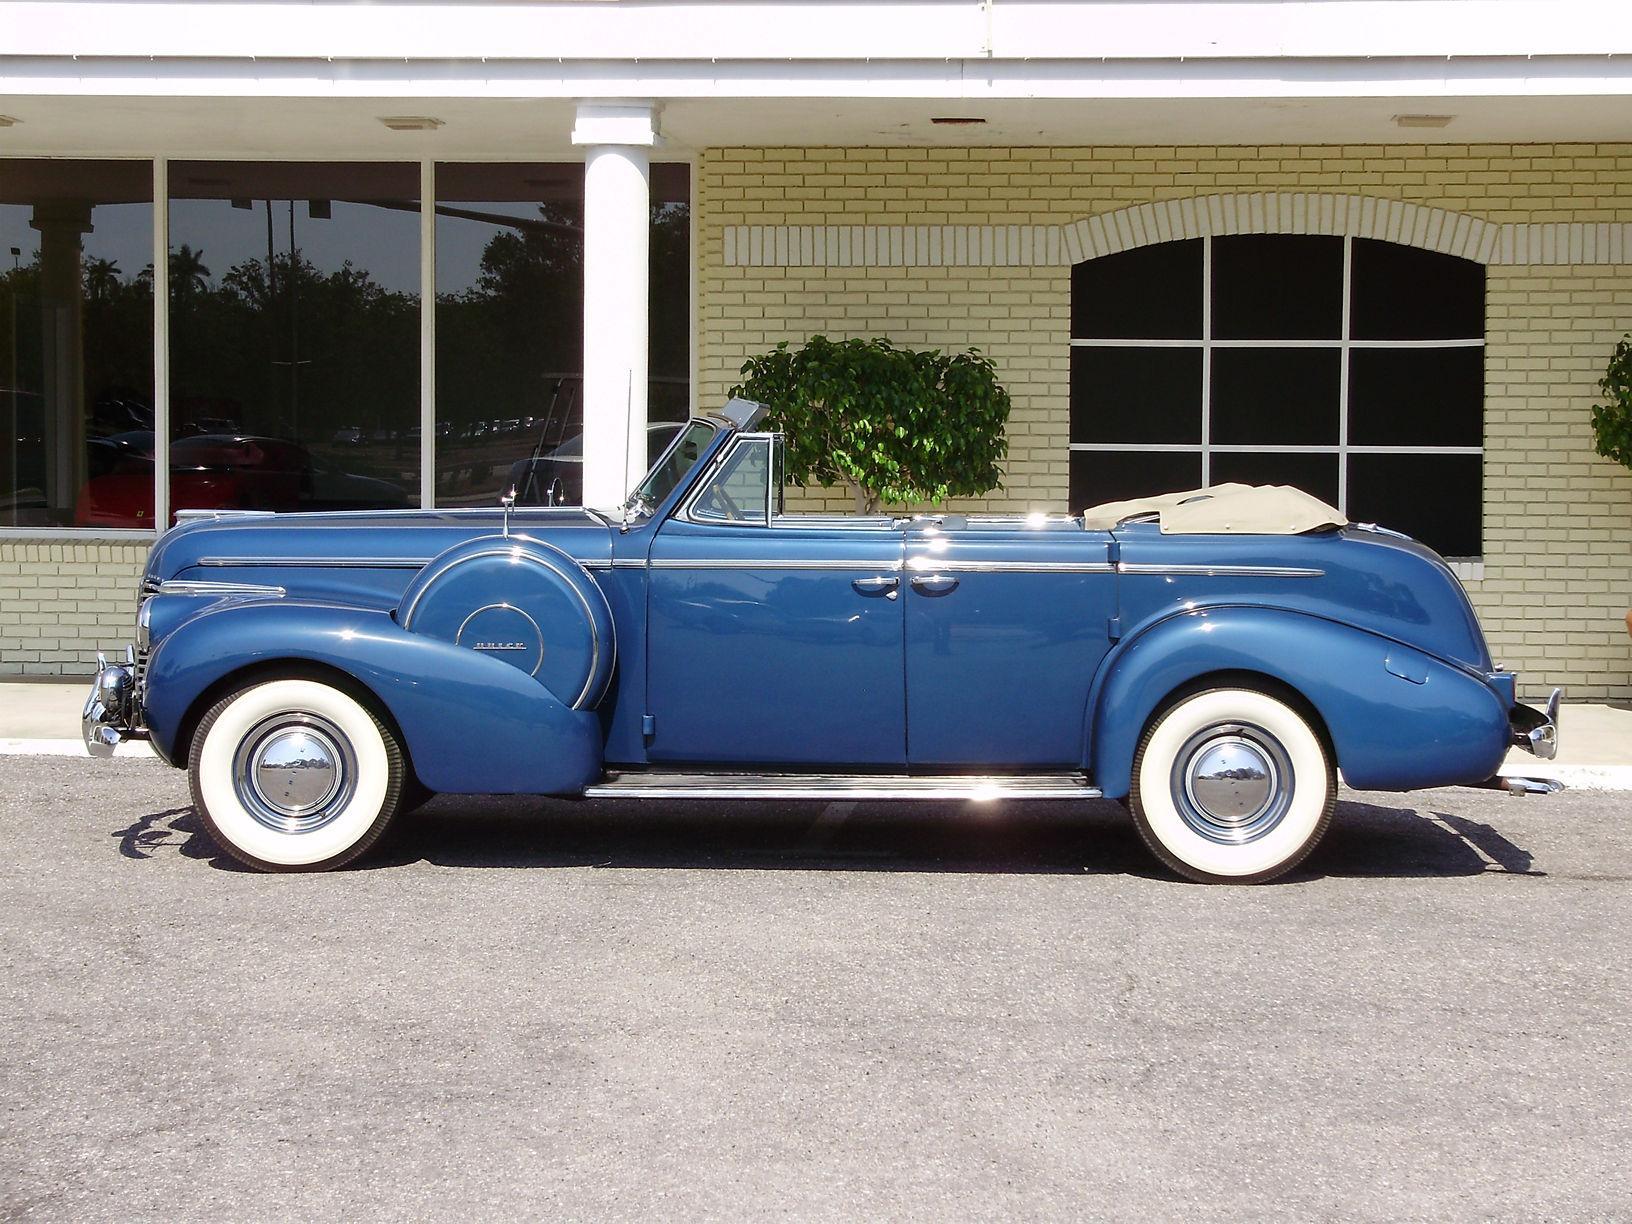 1940 BUICK CENTURY CONVERTIBLE SEDAN - Vintage Motors of Sarasota Inc. #3